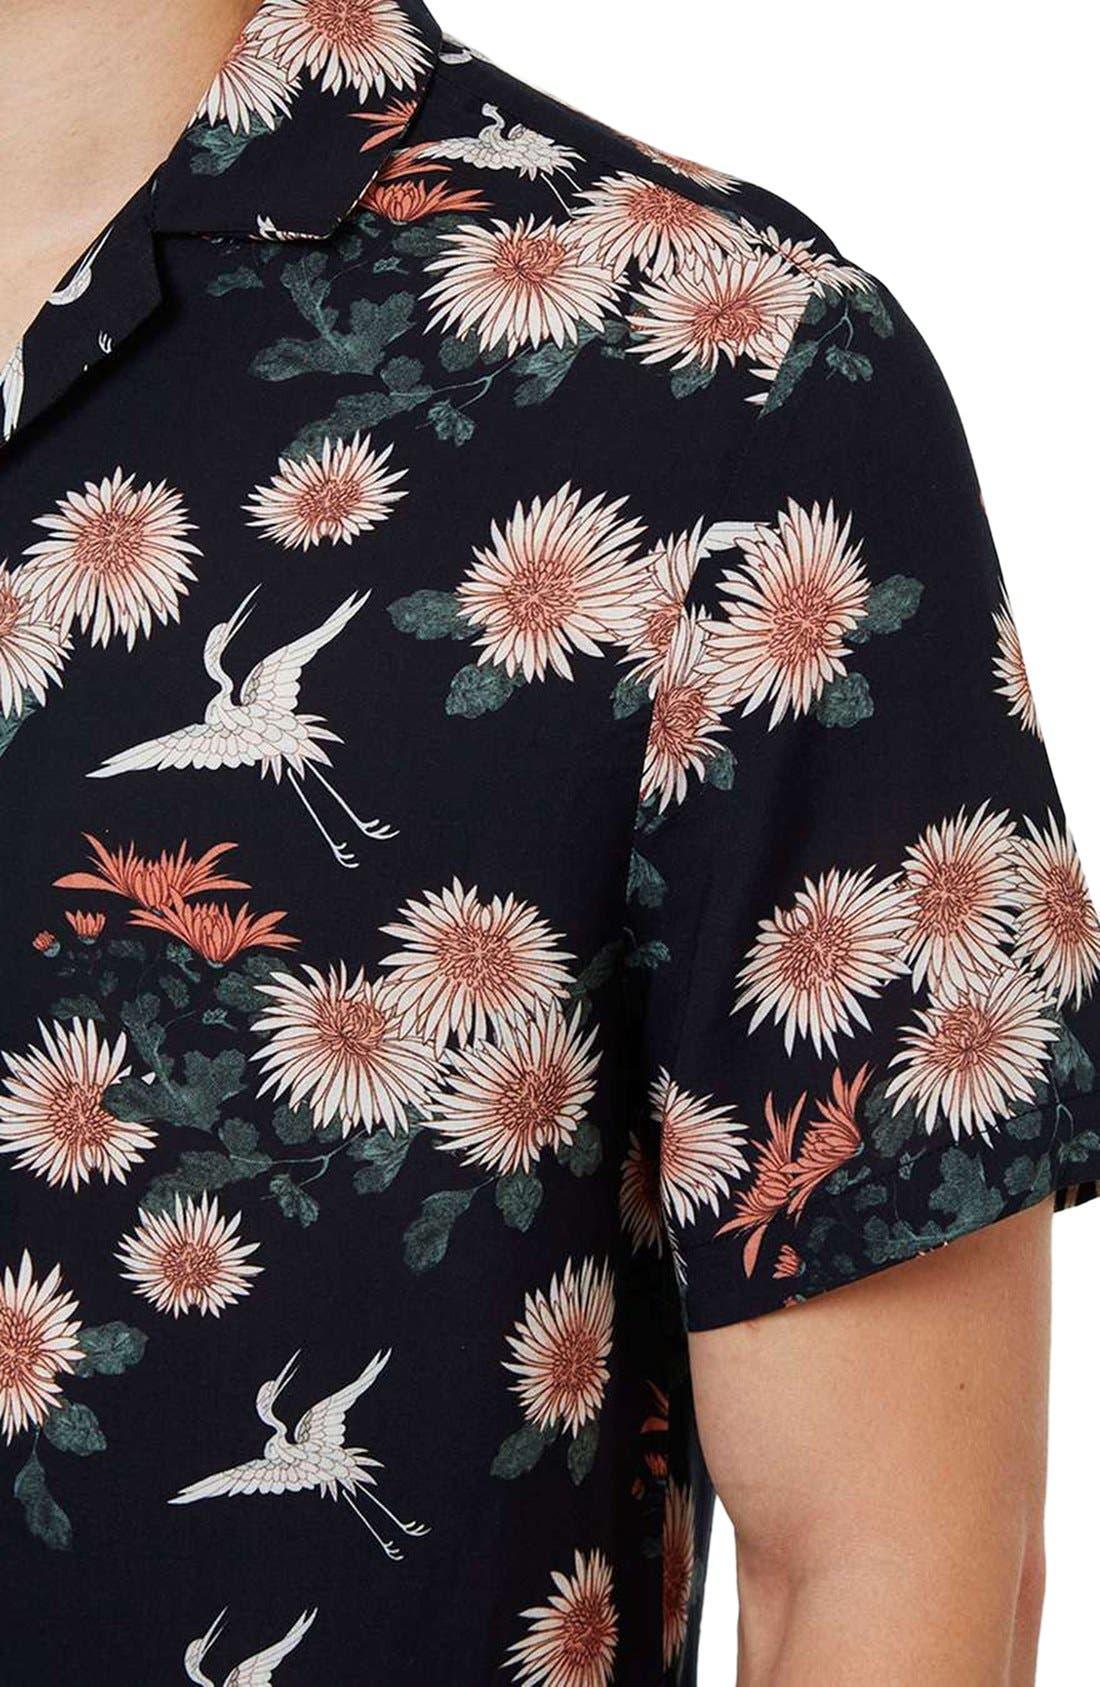 Floral Print Revere Collar Short Sleeve Shirt,                             Alternate thumbnail 2, color,                             001